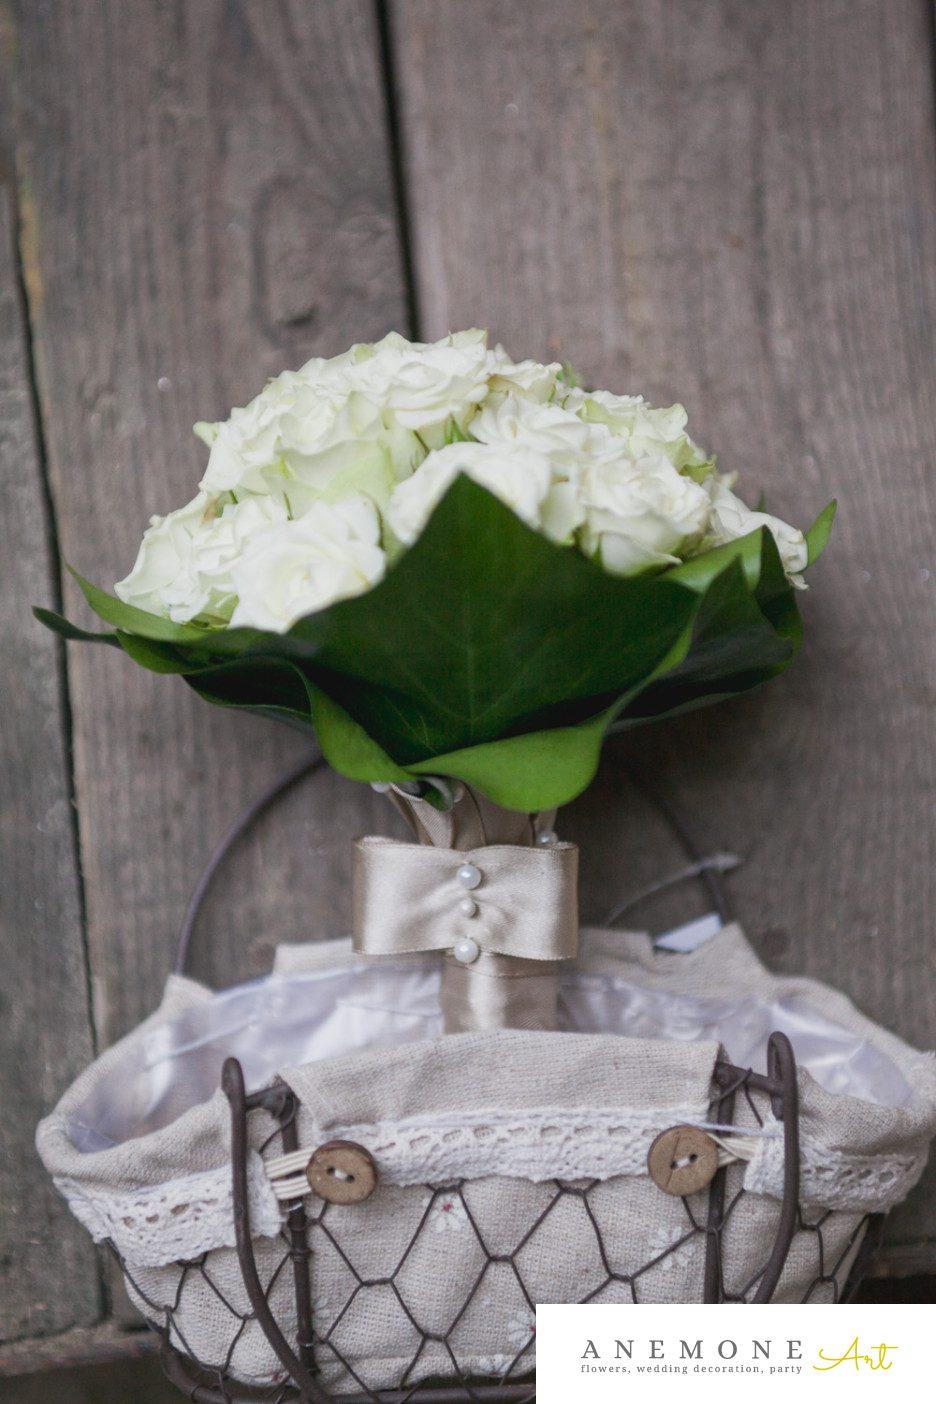 Poza, foto cu Flori de nunta buchet mireasa, crengi, legat, portocaliu, toamna in Arad, Timisoara, Oradea (wedding flowers, bouquets) nunta Arad, Timisoara, Oradea